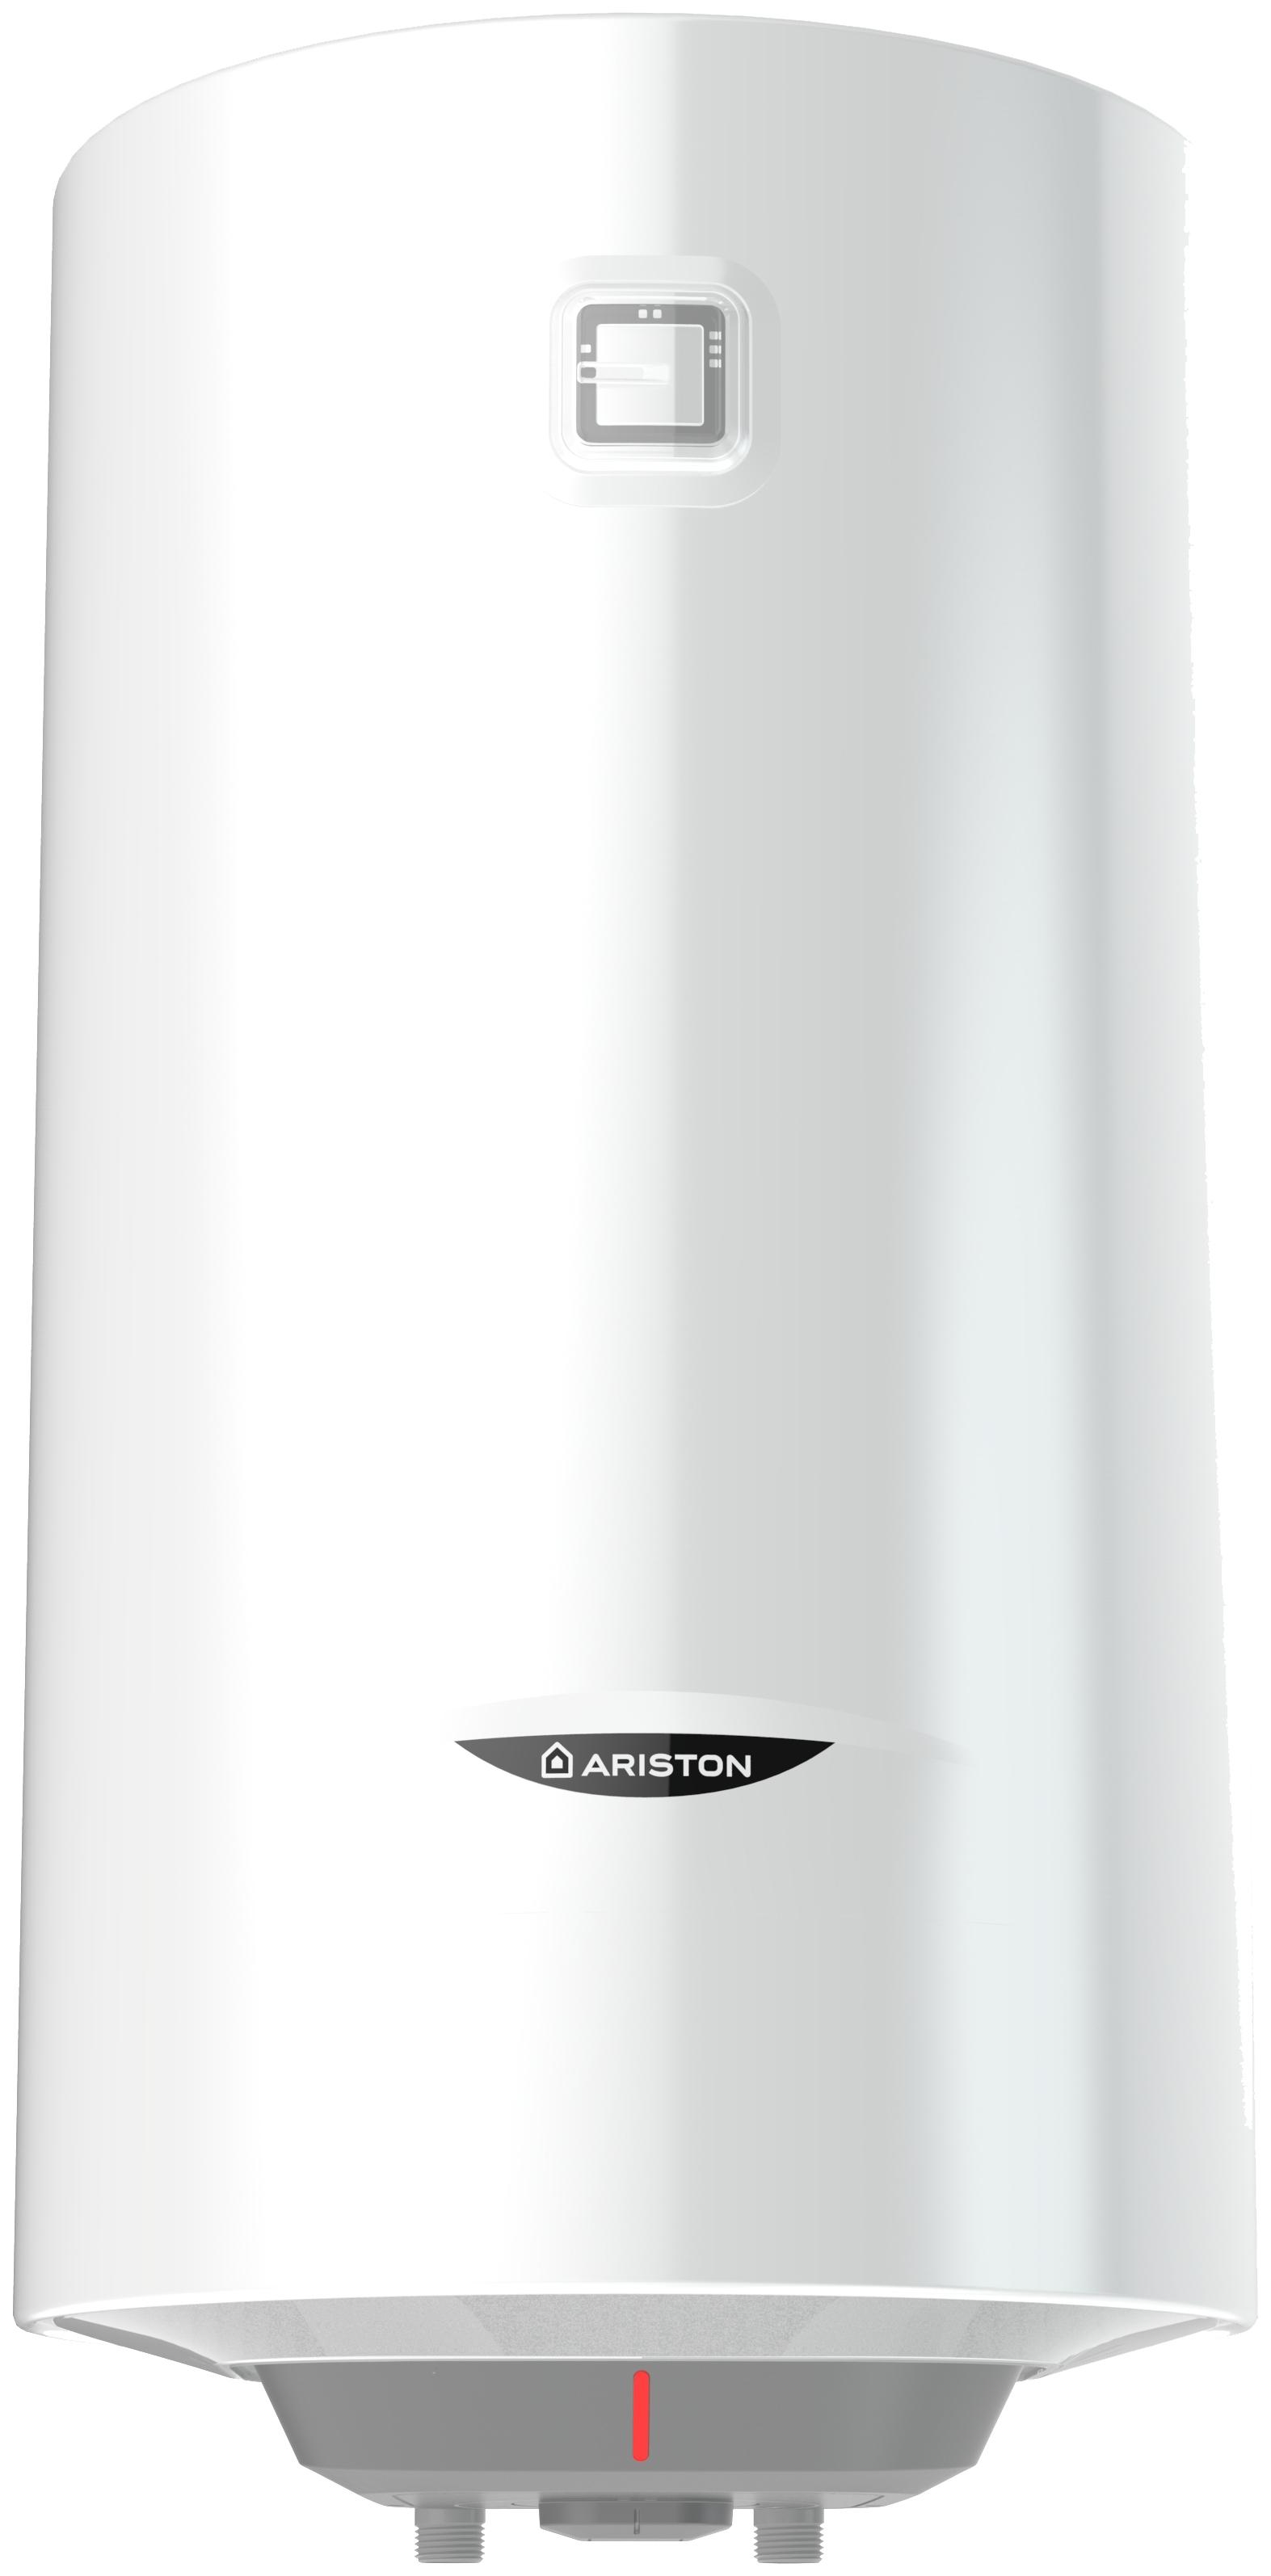 HOTPOINT-ARISTON PRO1 R ABS 80 V SLIM